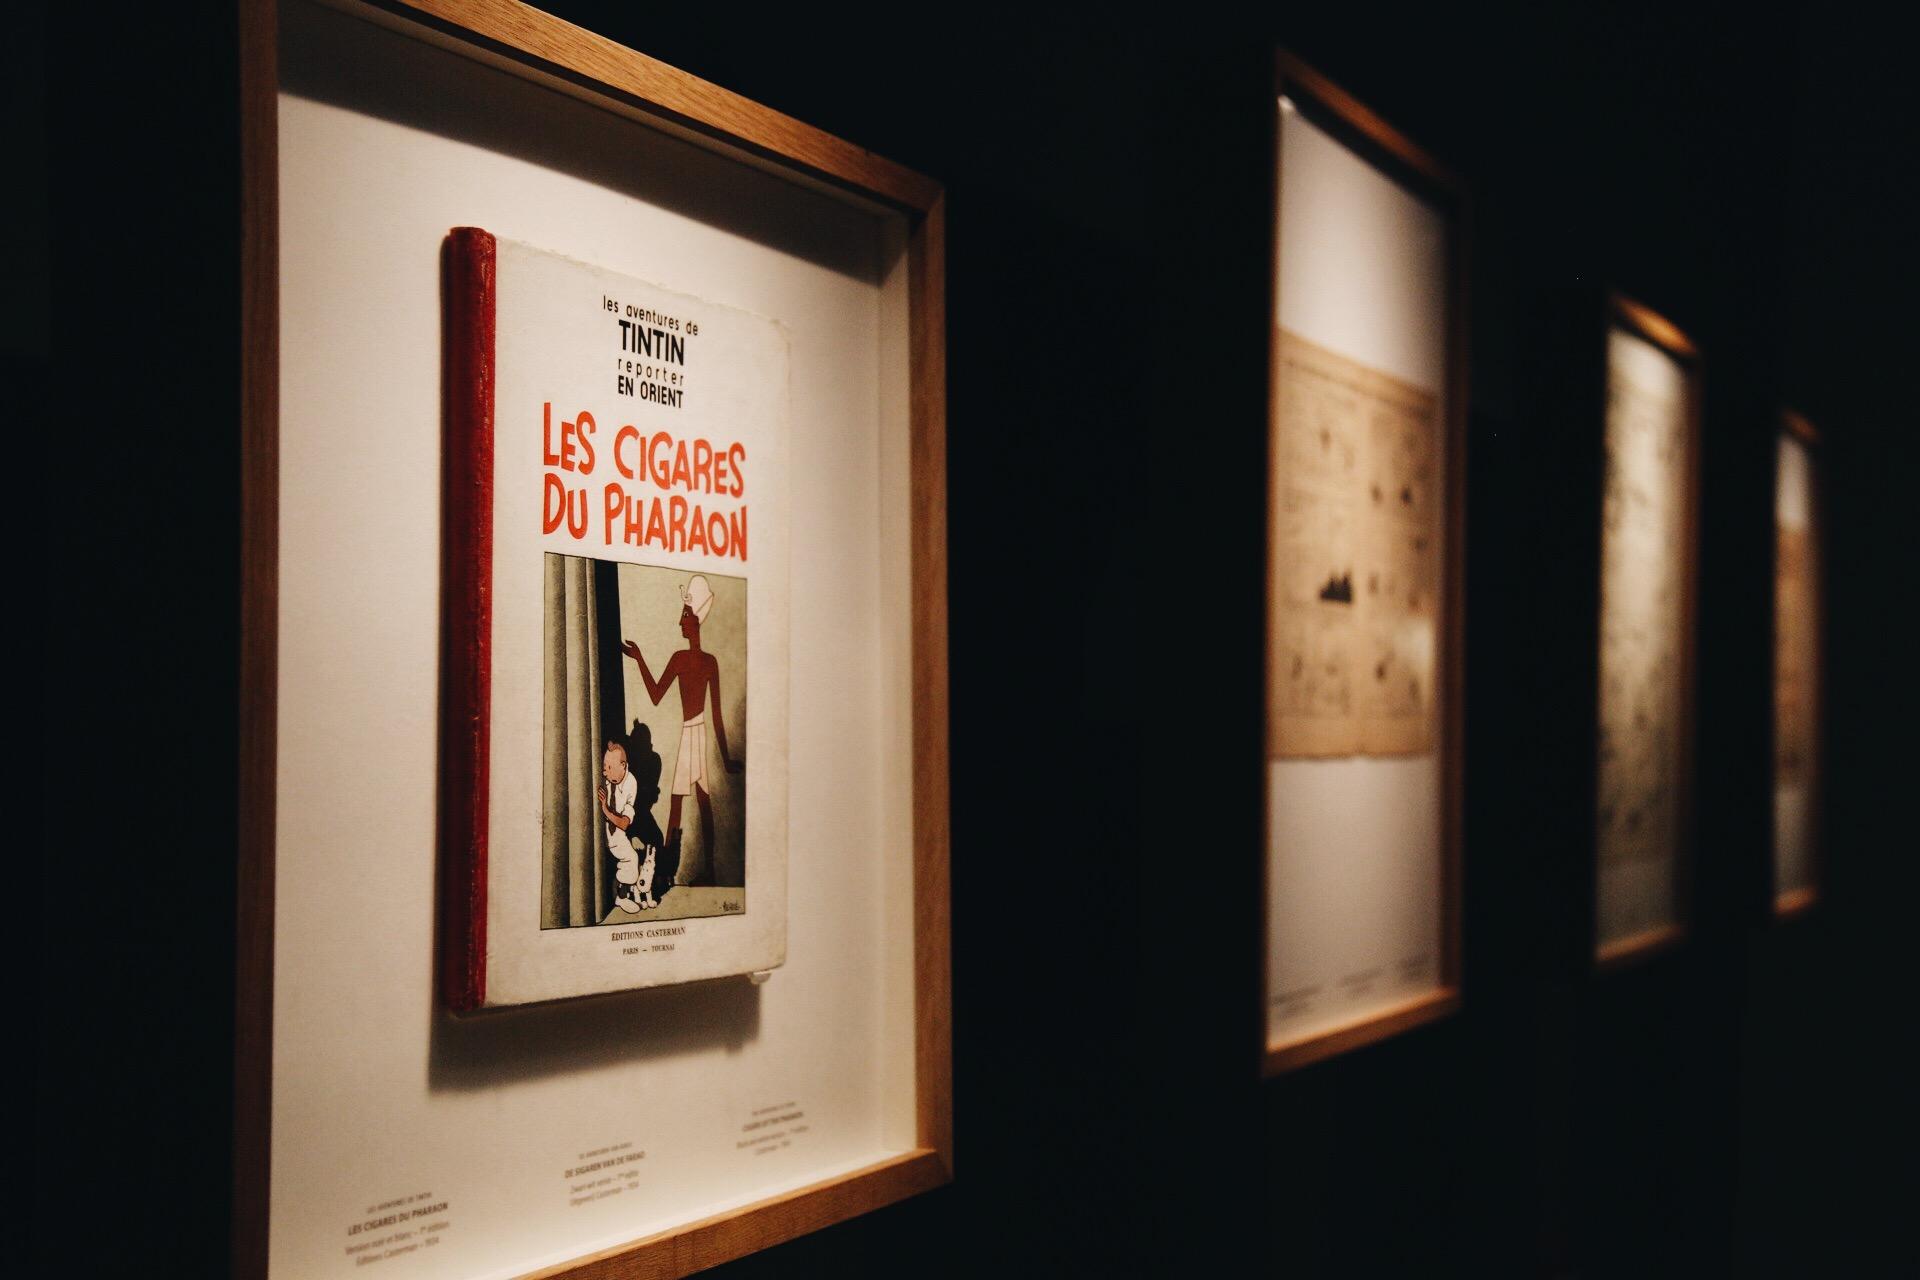 musée-hergé-cigare-du-pharaon-tintin-belgique.JPG